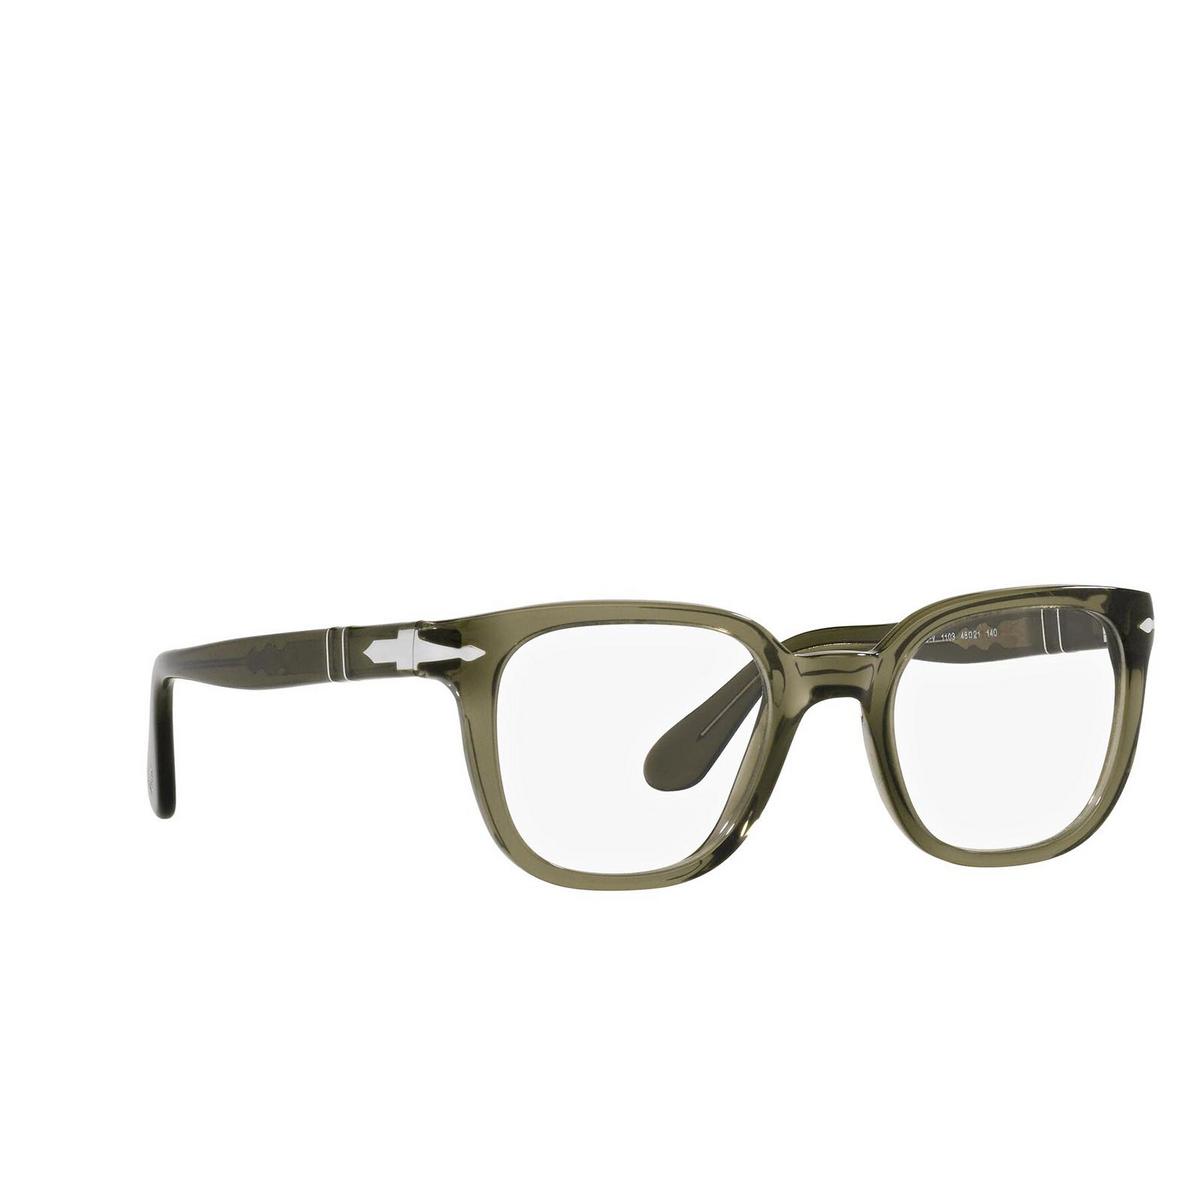 Persol® Square Eyeglasses: PO3263V color Grey 1103 - three-quarters view.